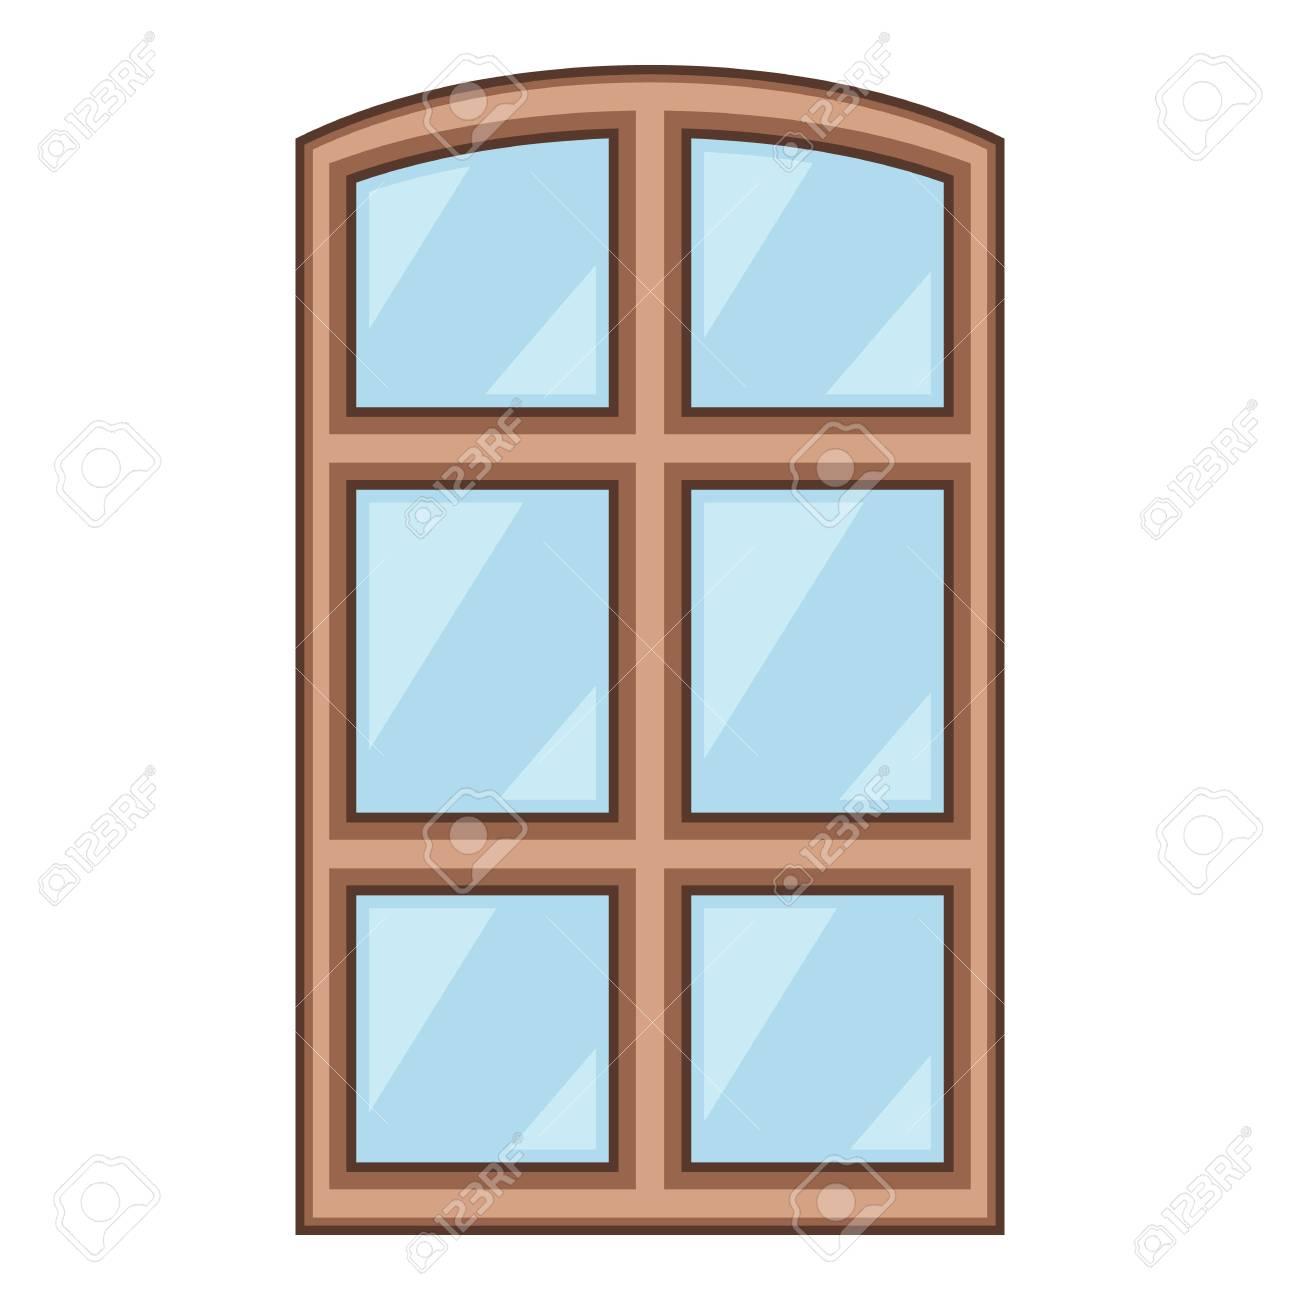 Icône De Cadre De Fenêtre En Bois Style Cartoon Clip Art Libres De